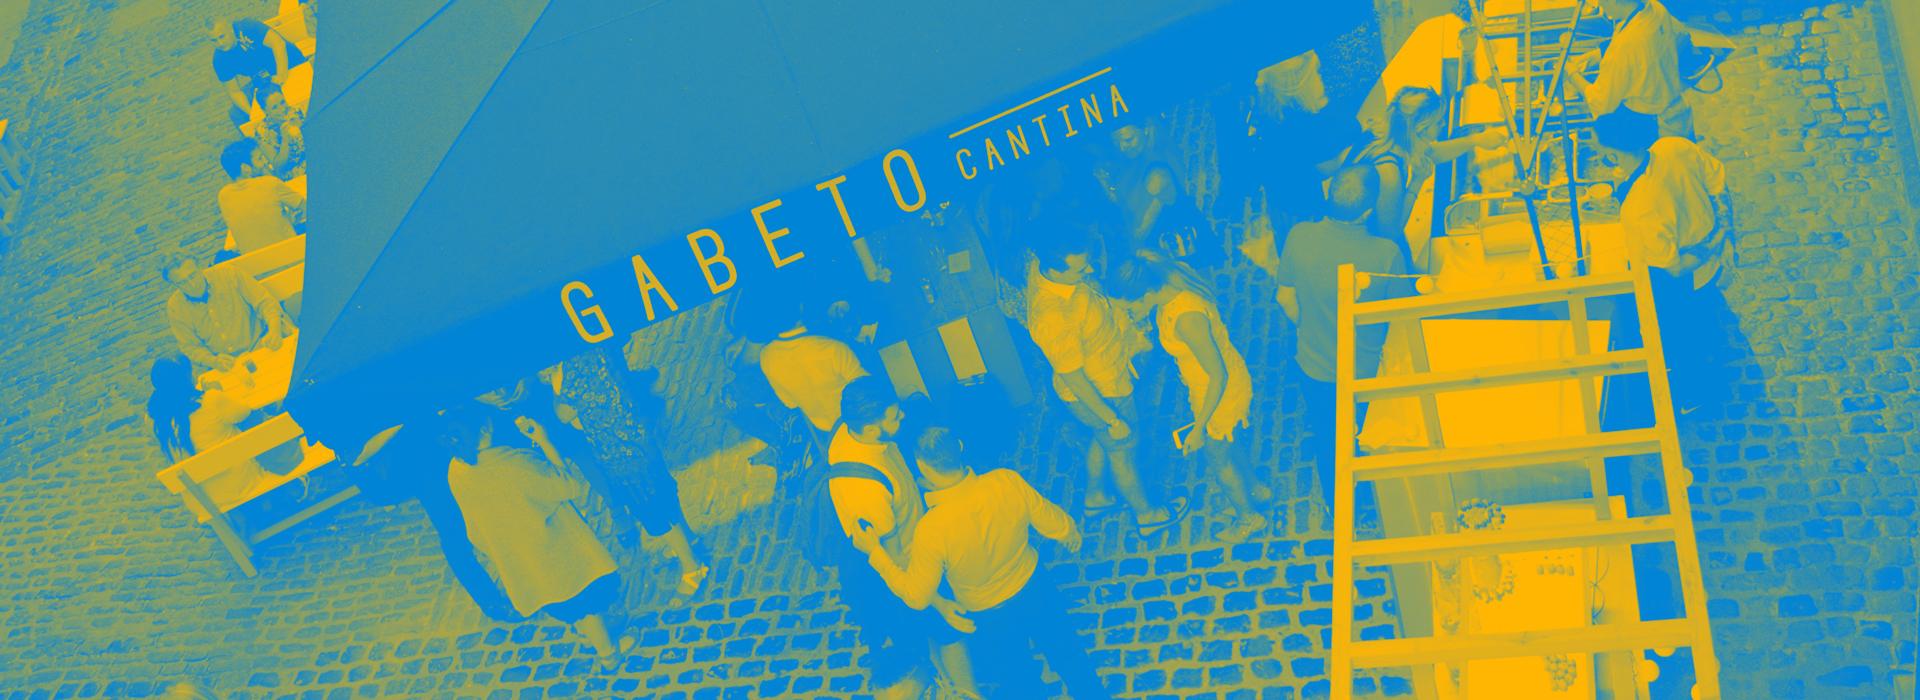 Gabeto ambition